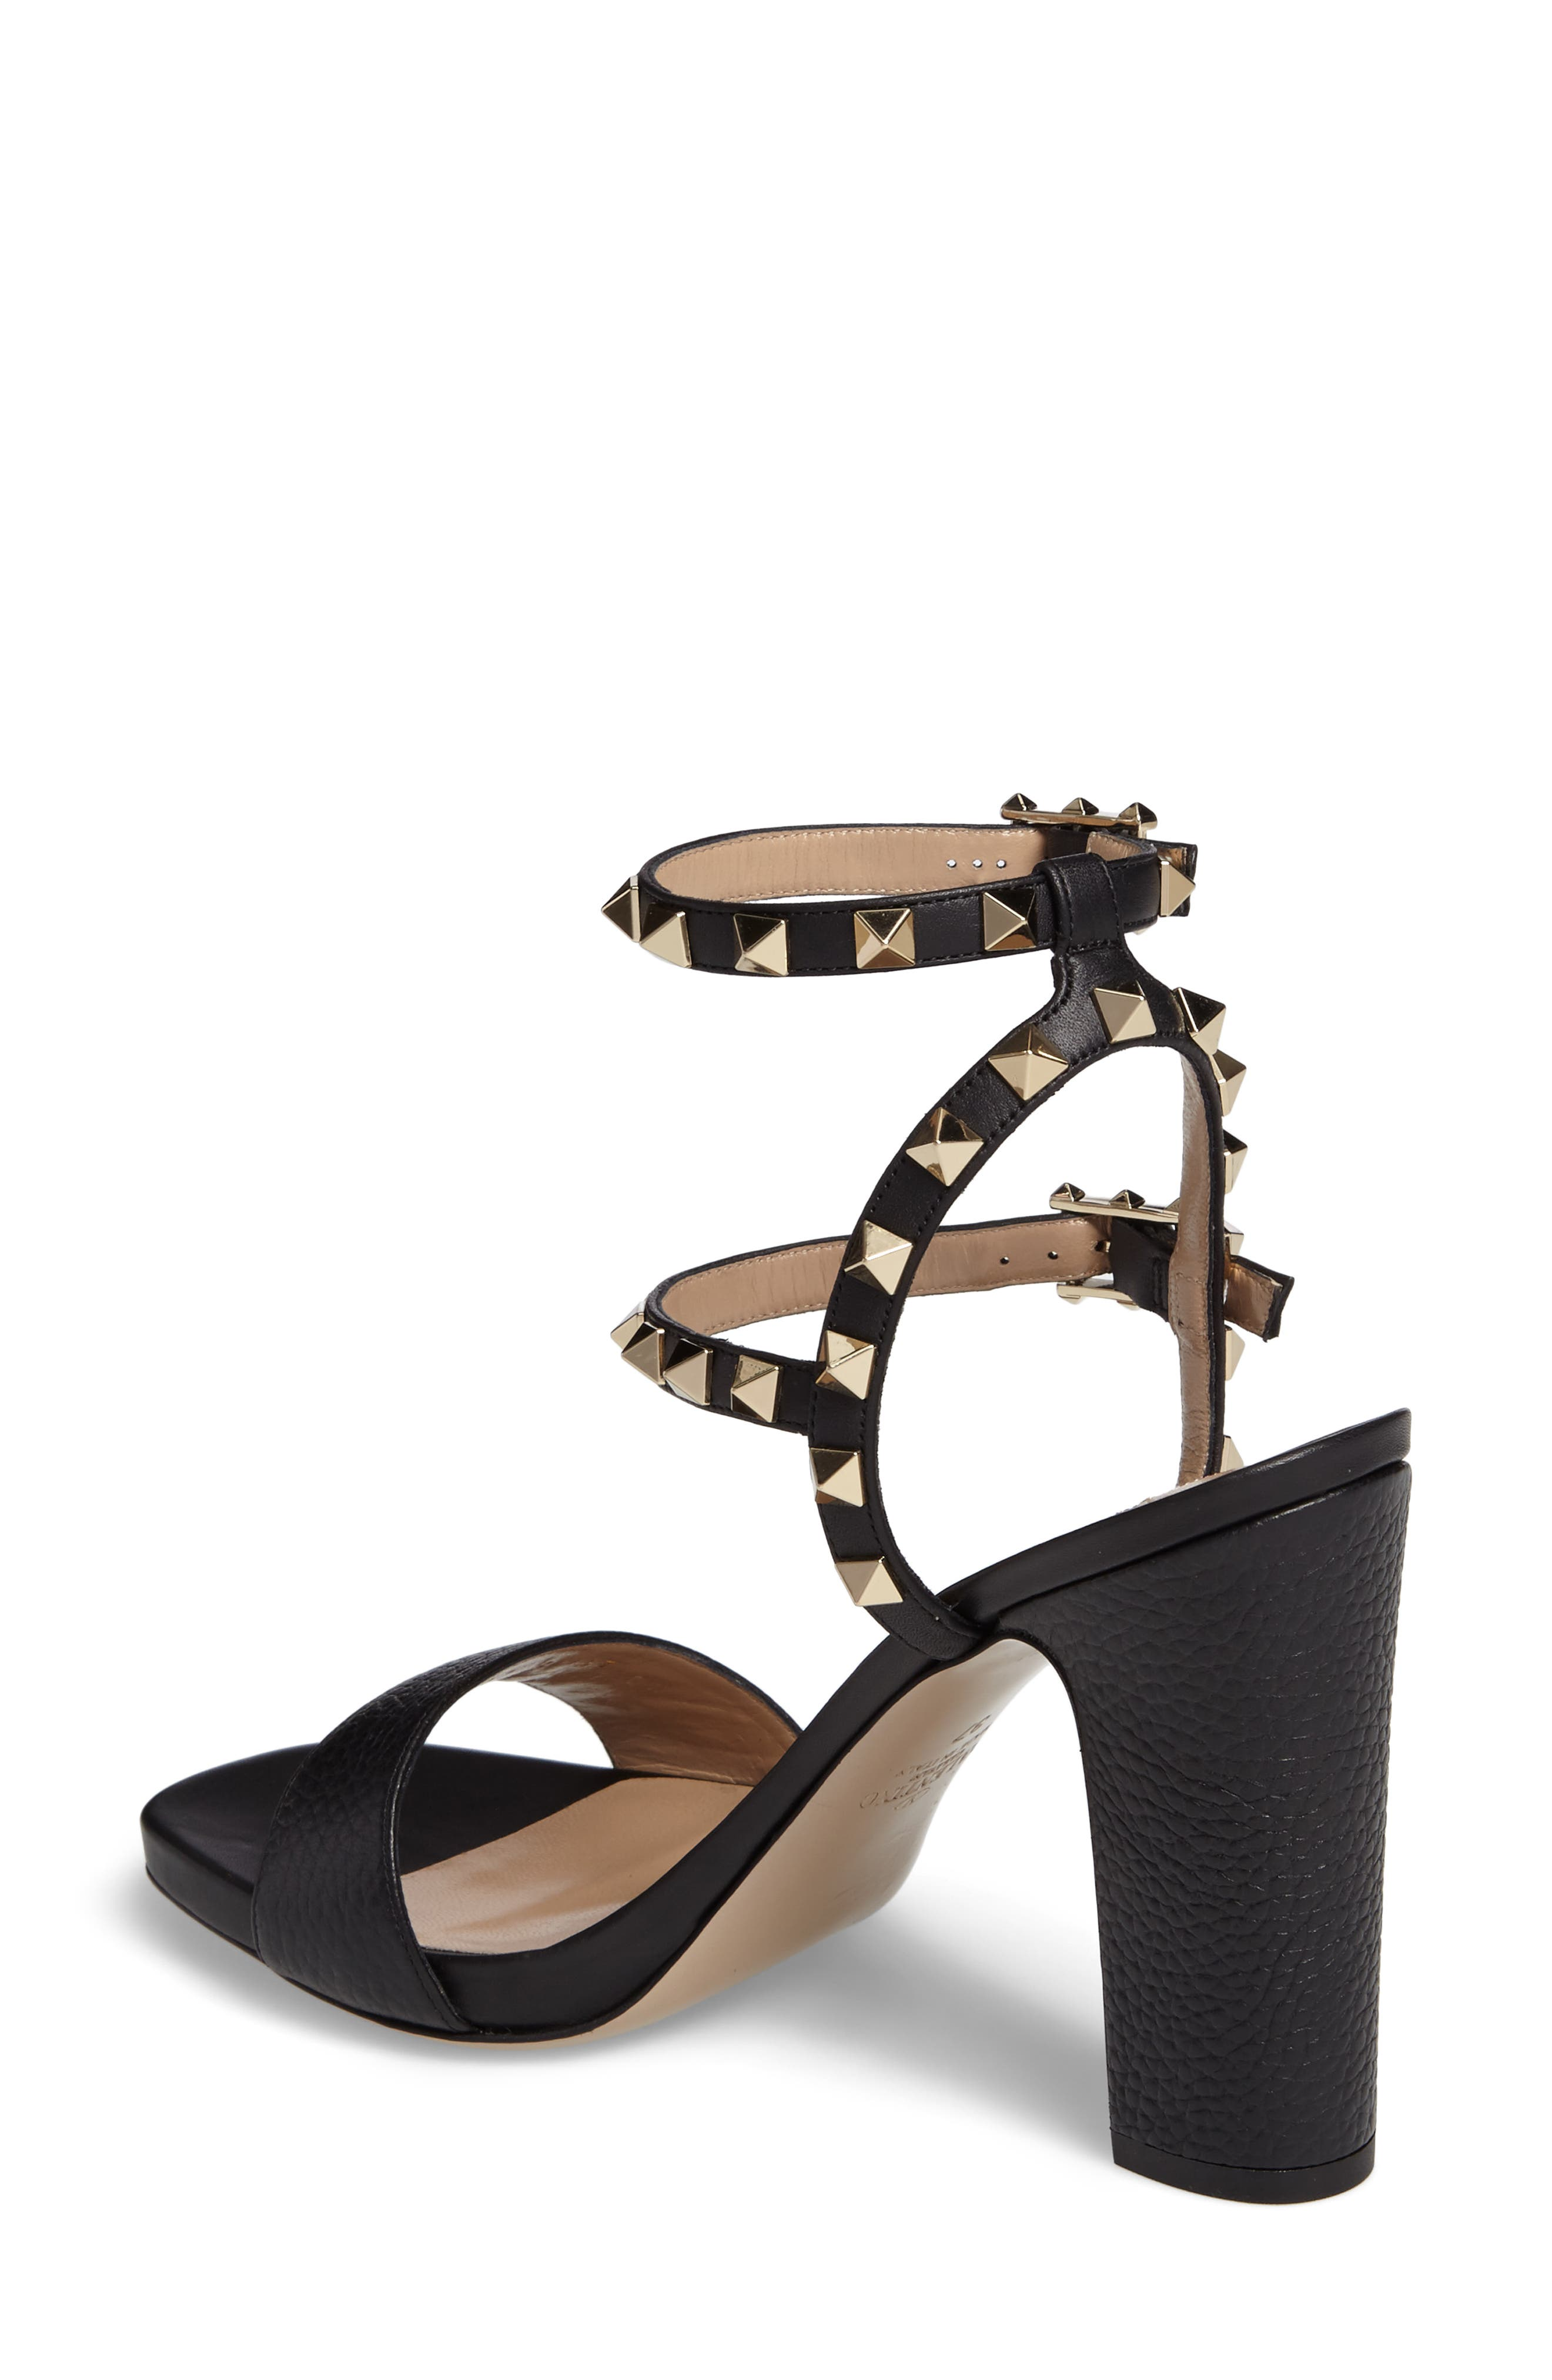 Rockstud Ankle Strap Sandal,                             Alternate thumbnail 2, color,                             BLACK